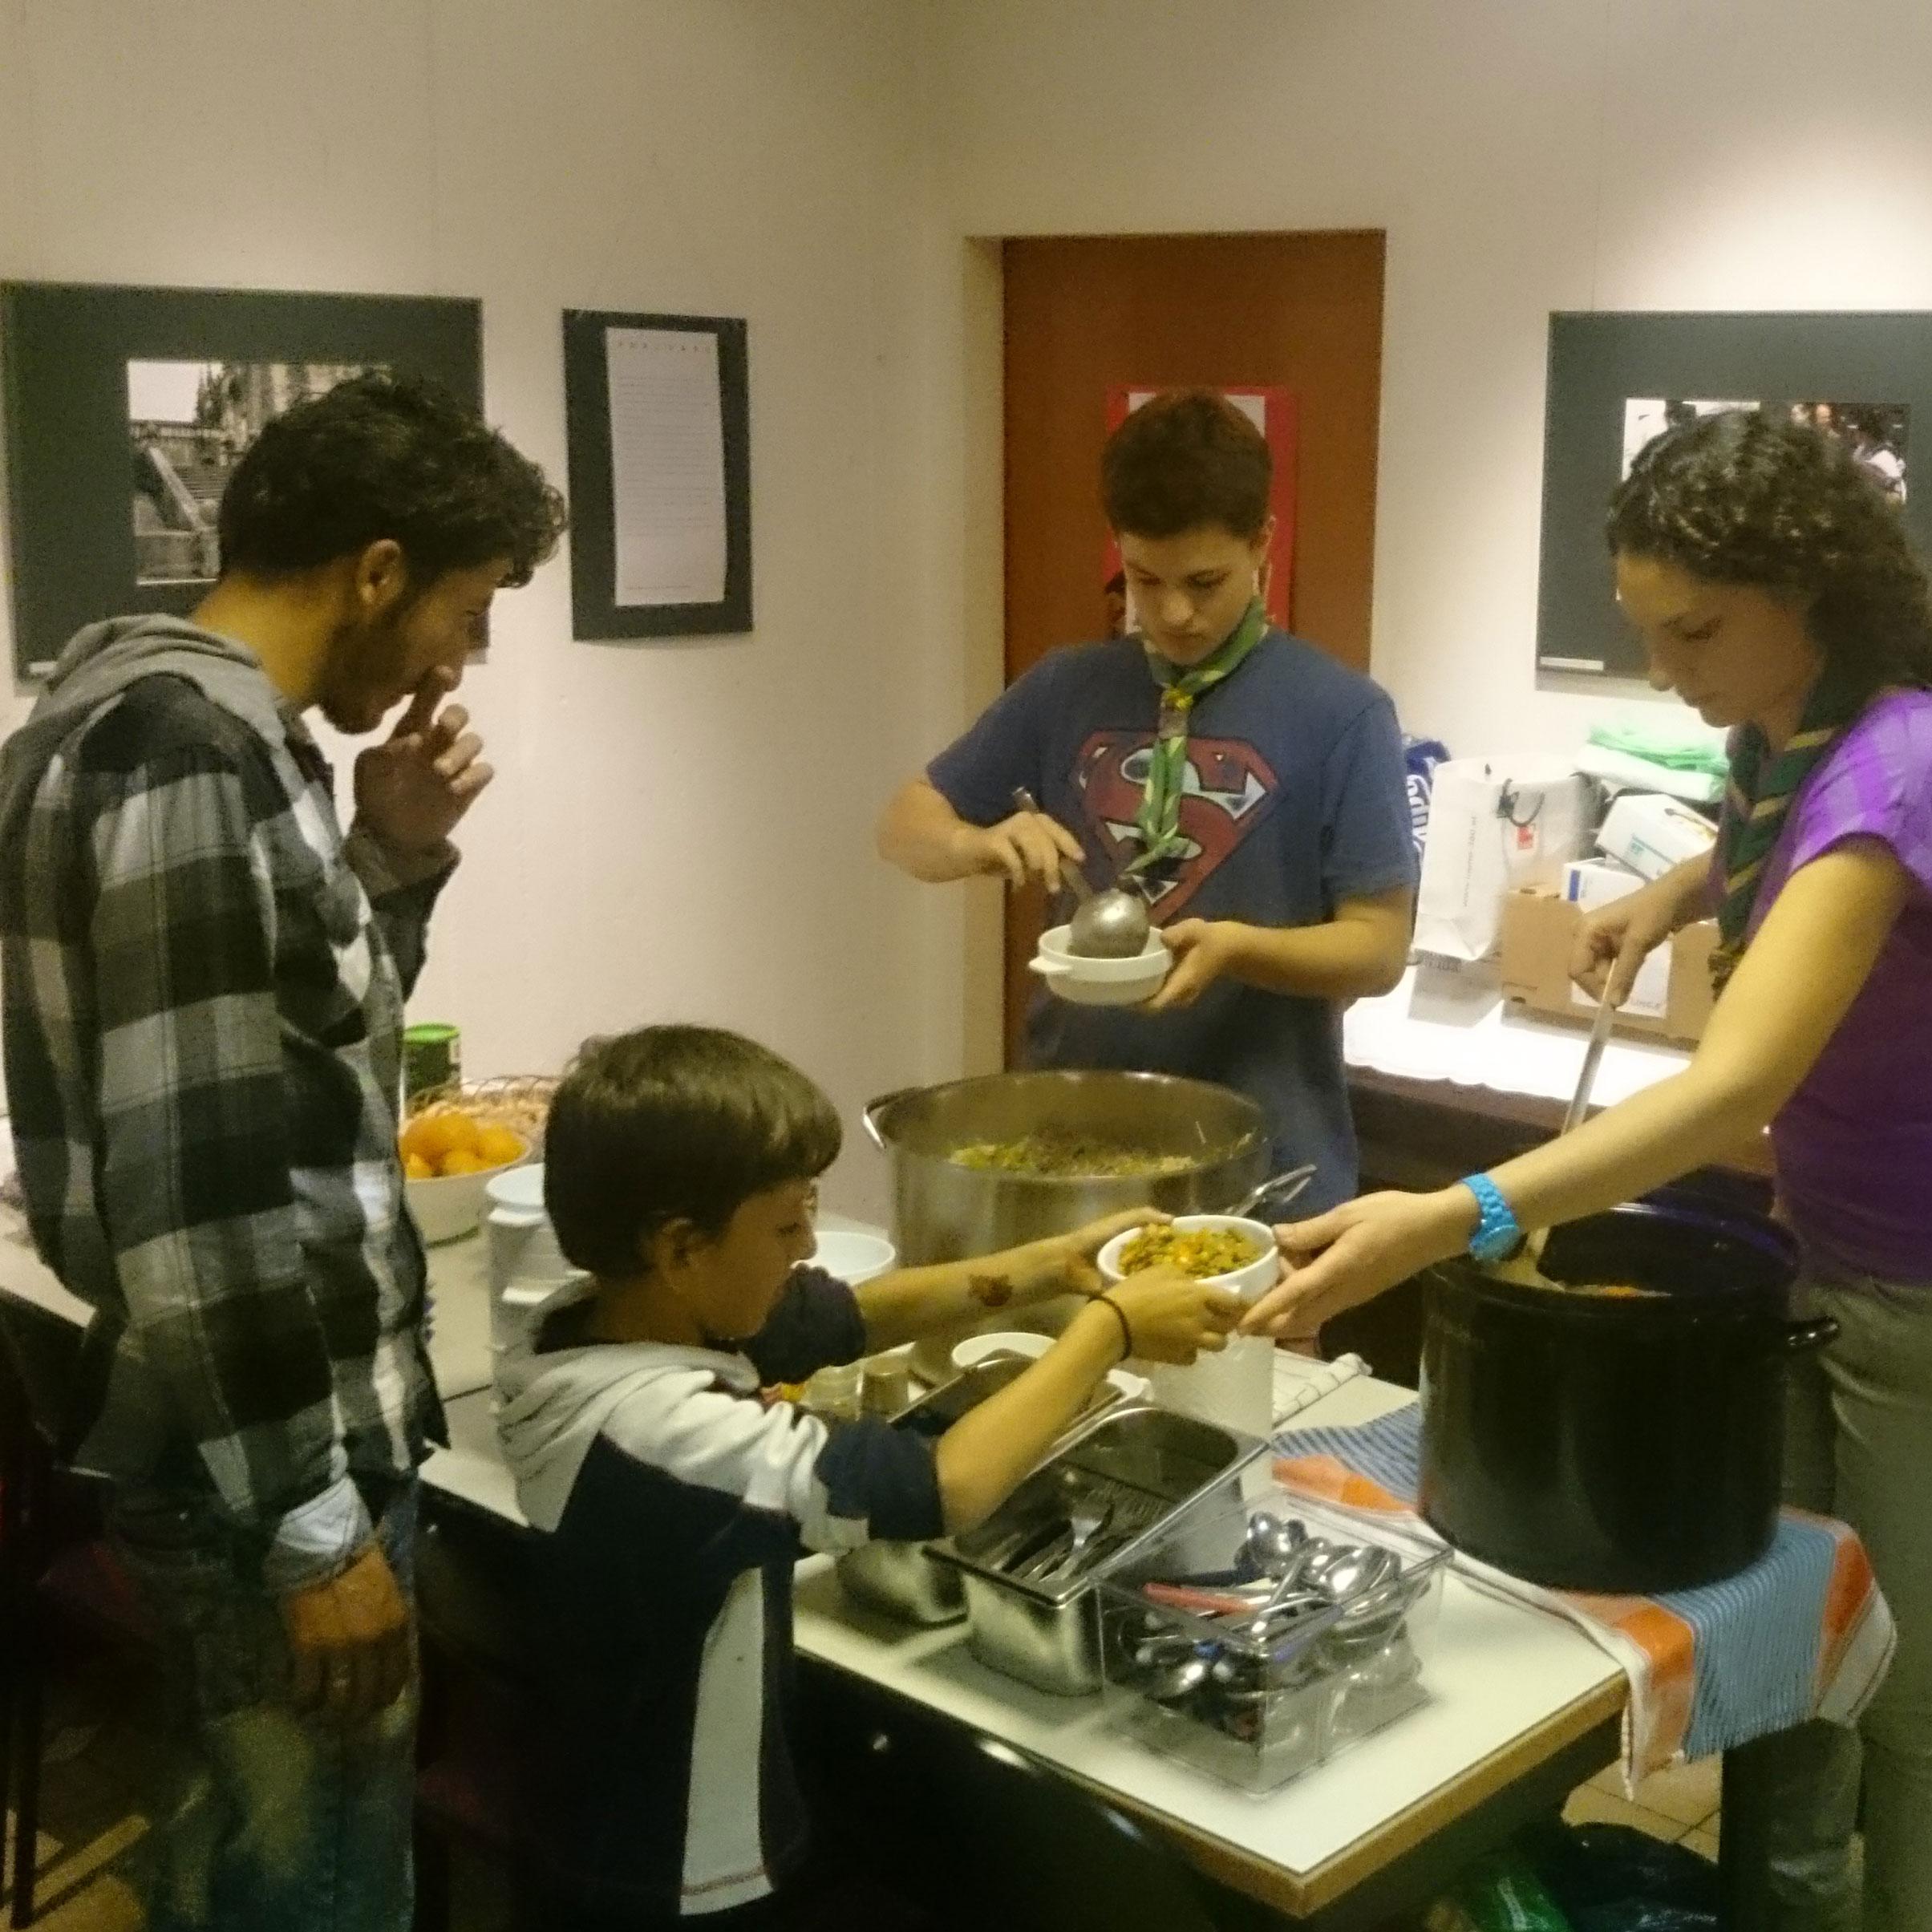 Gruppe 81 kocht für Flüchtlinge – end (?) of an era